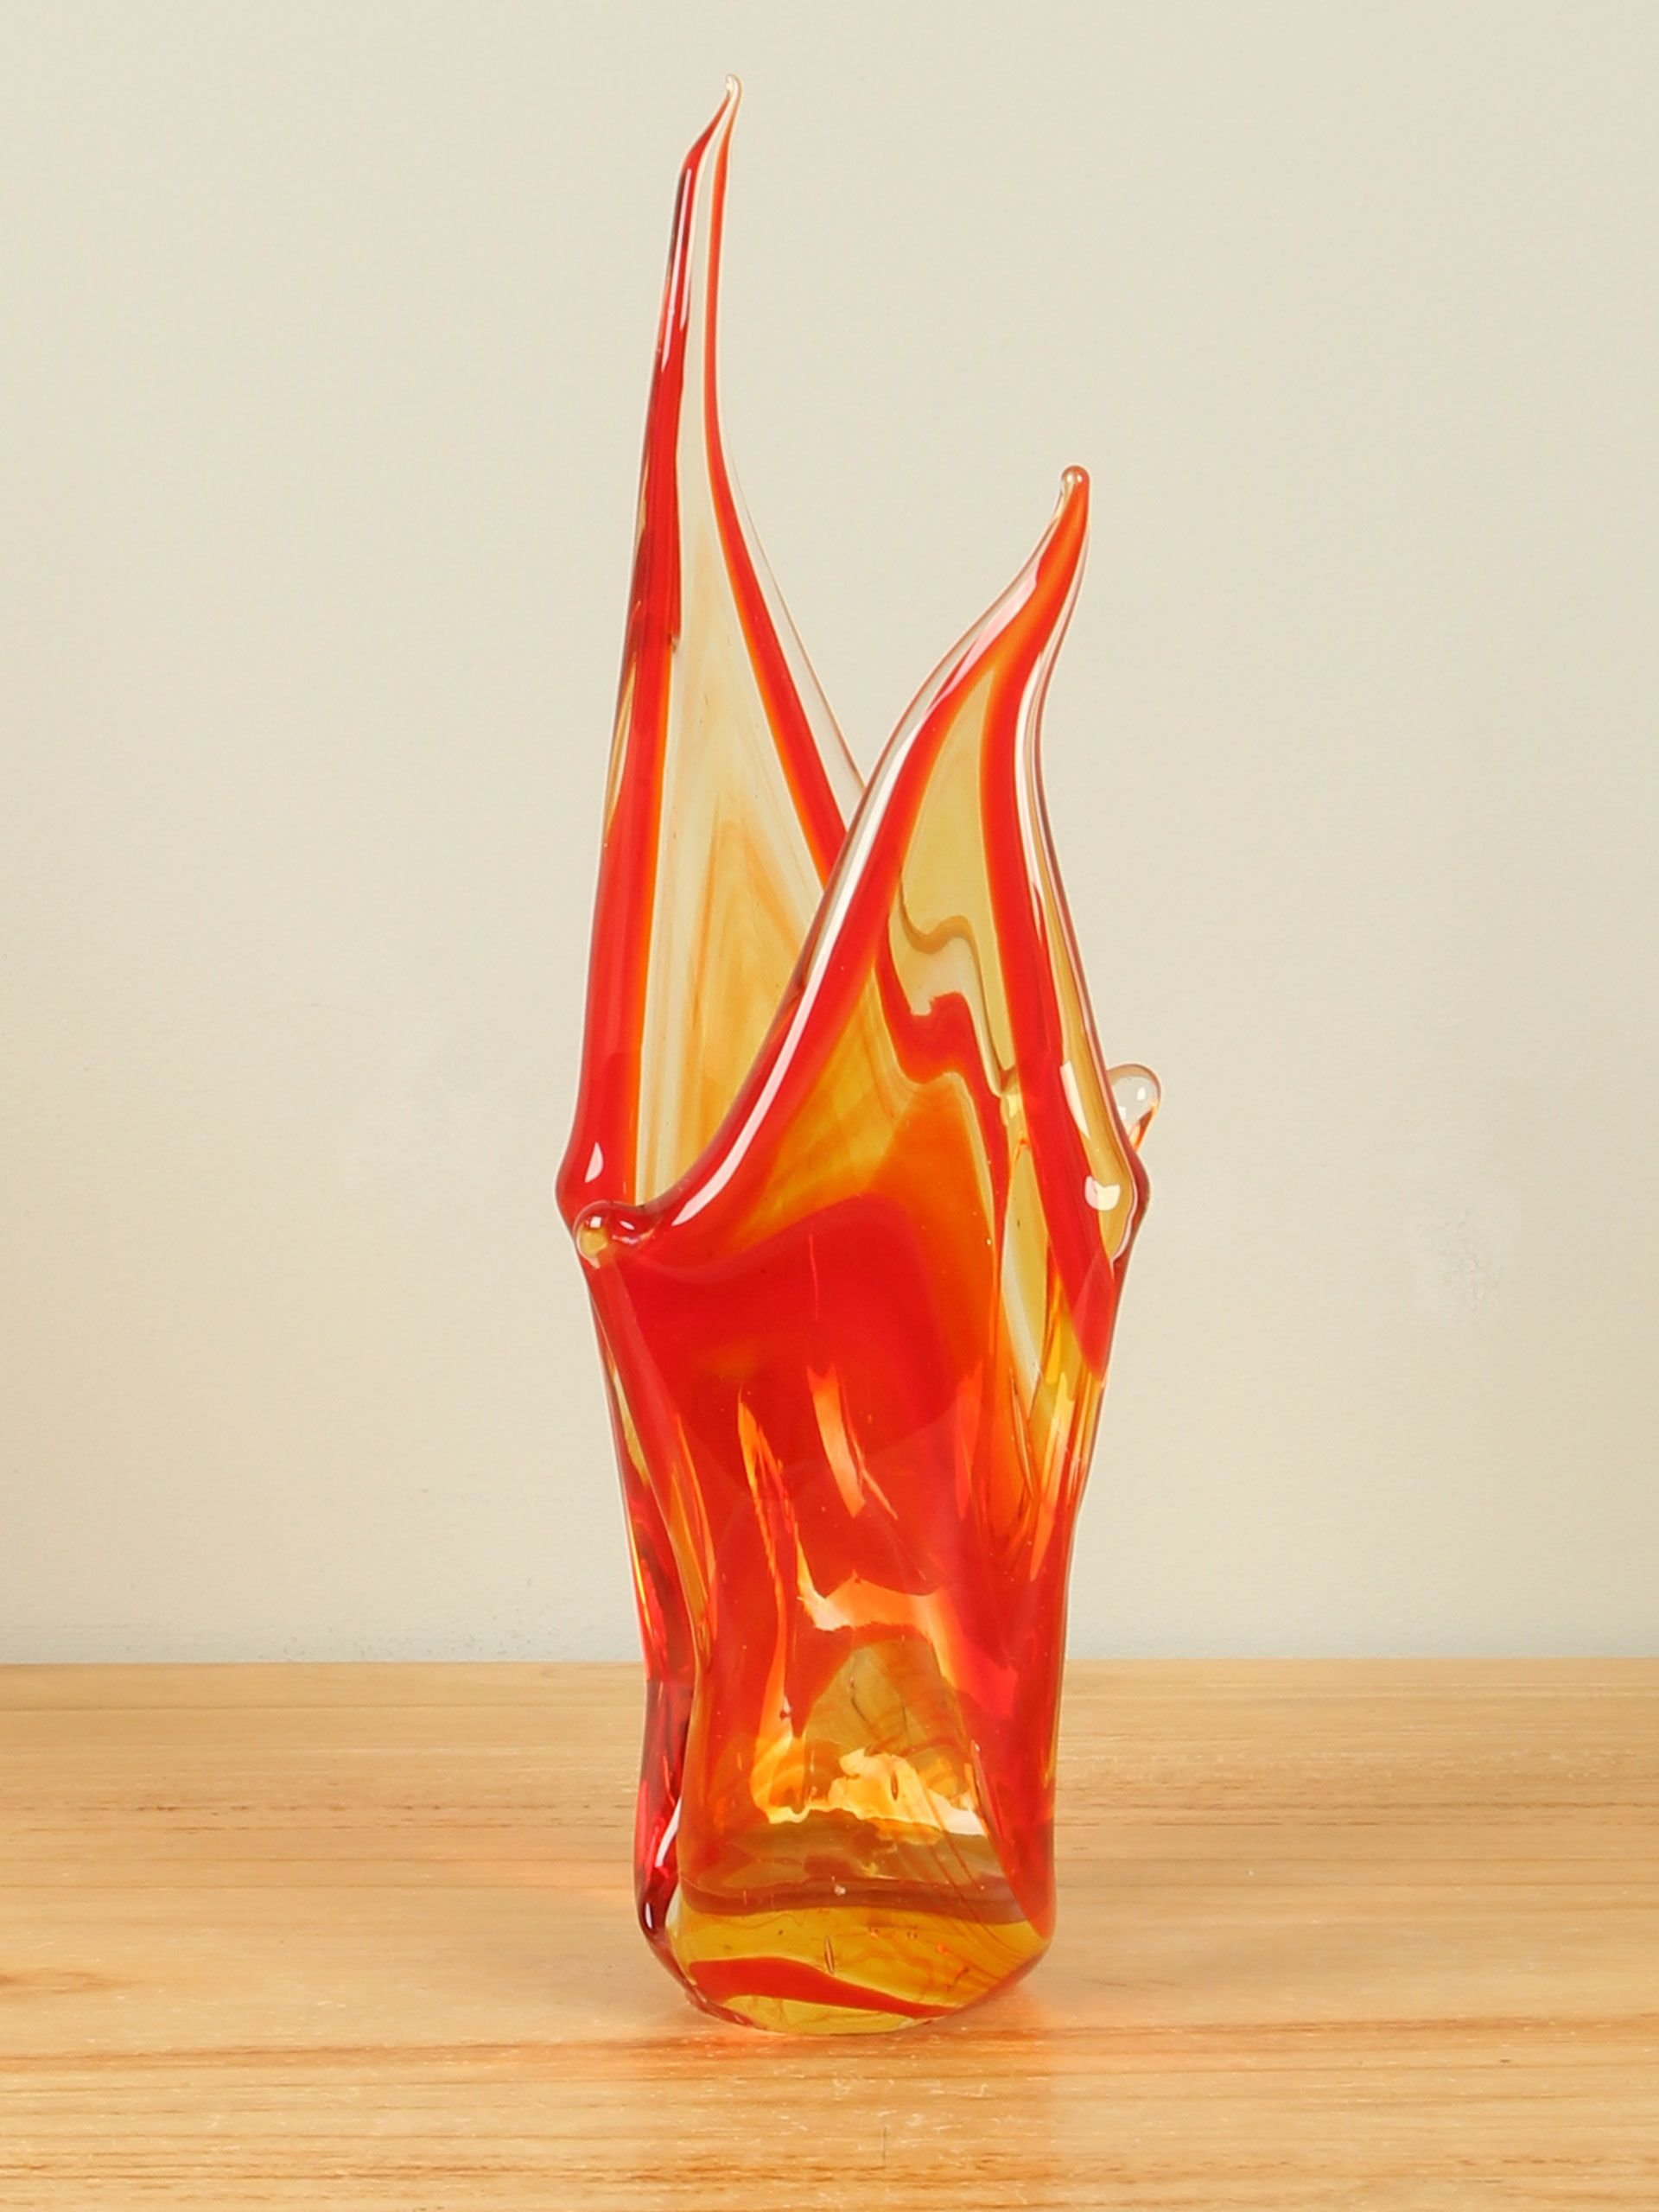 Vlam glas rood/geel, 24 cm 2a008